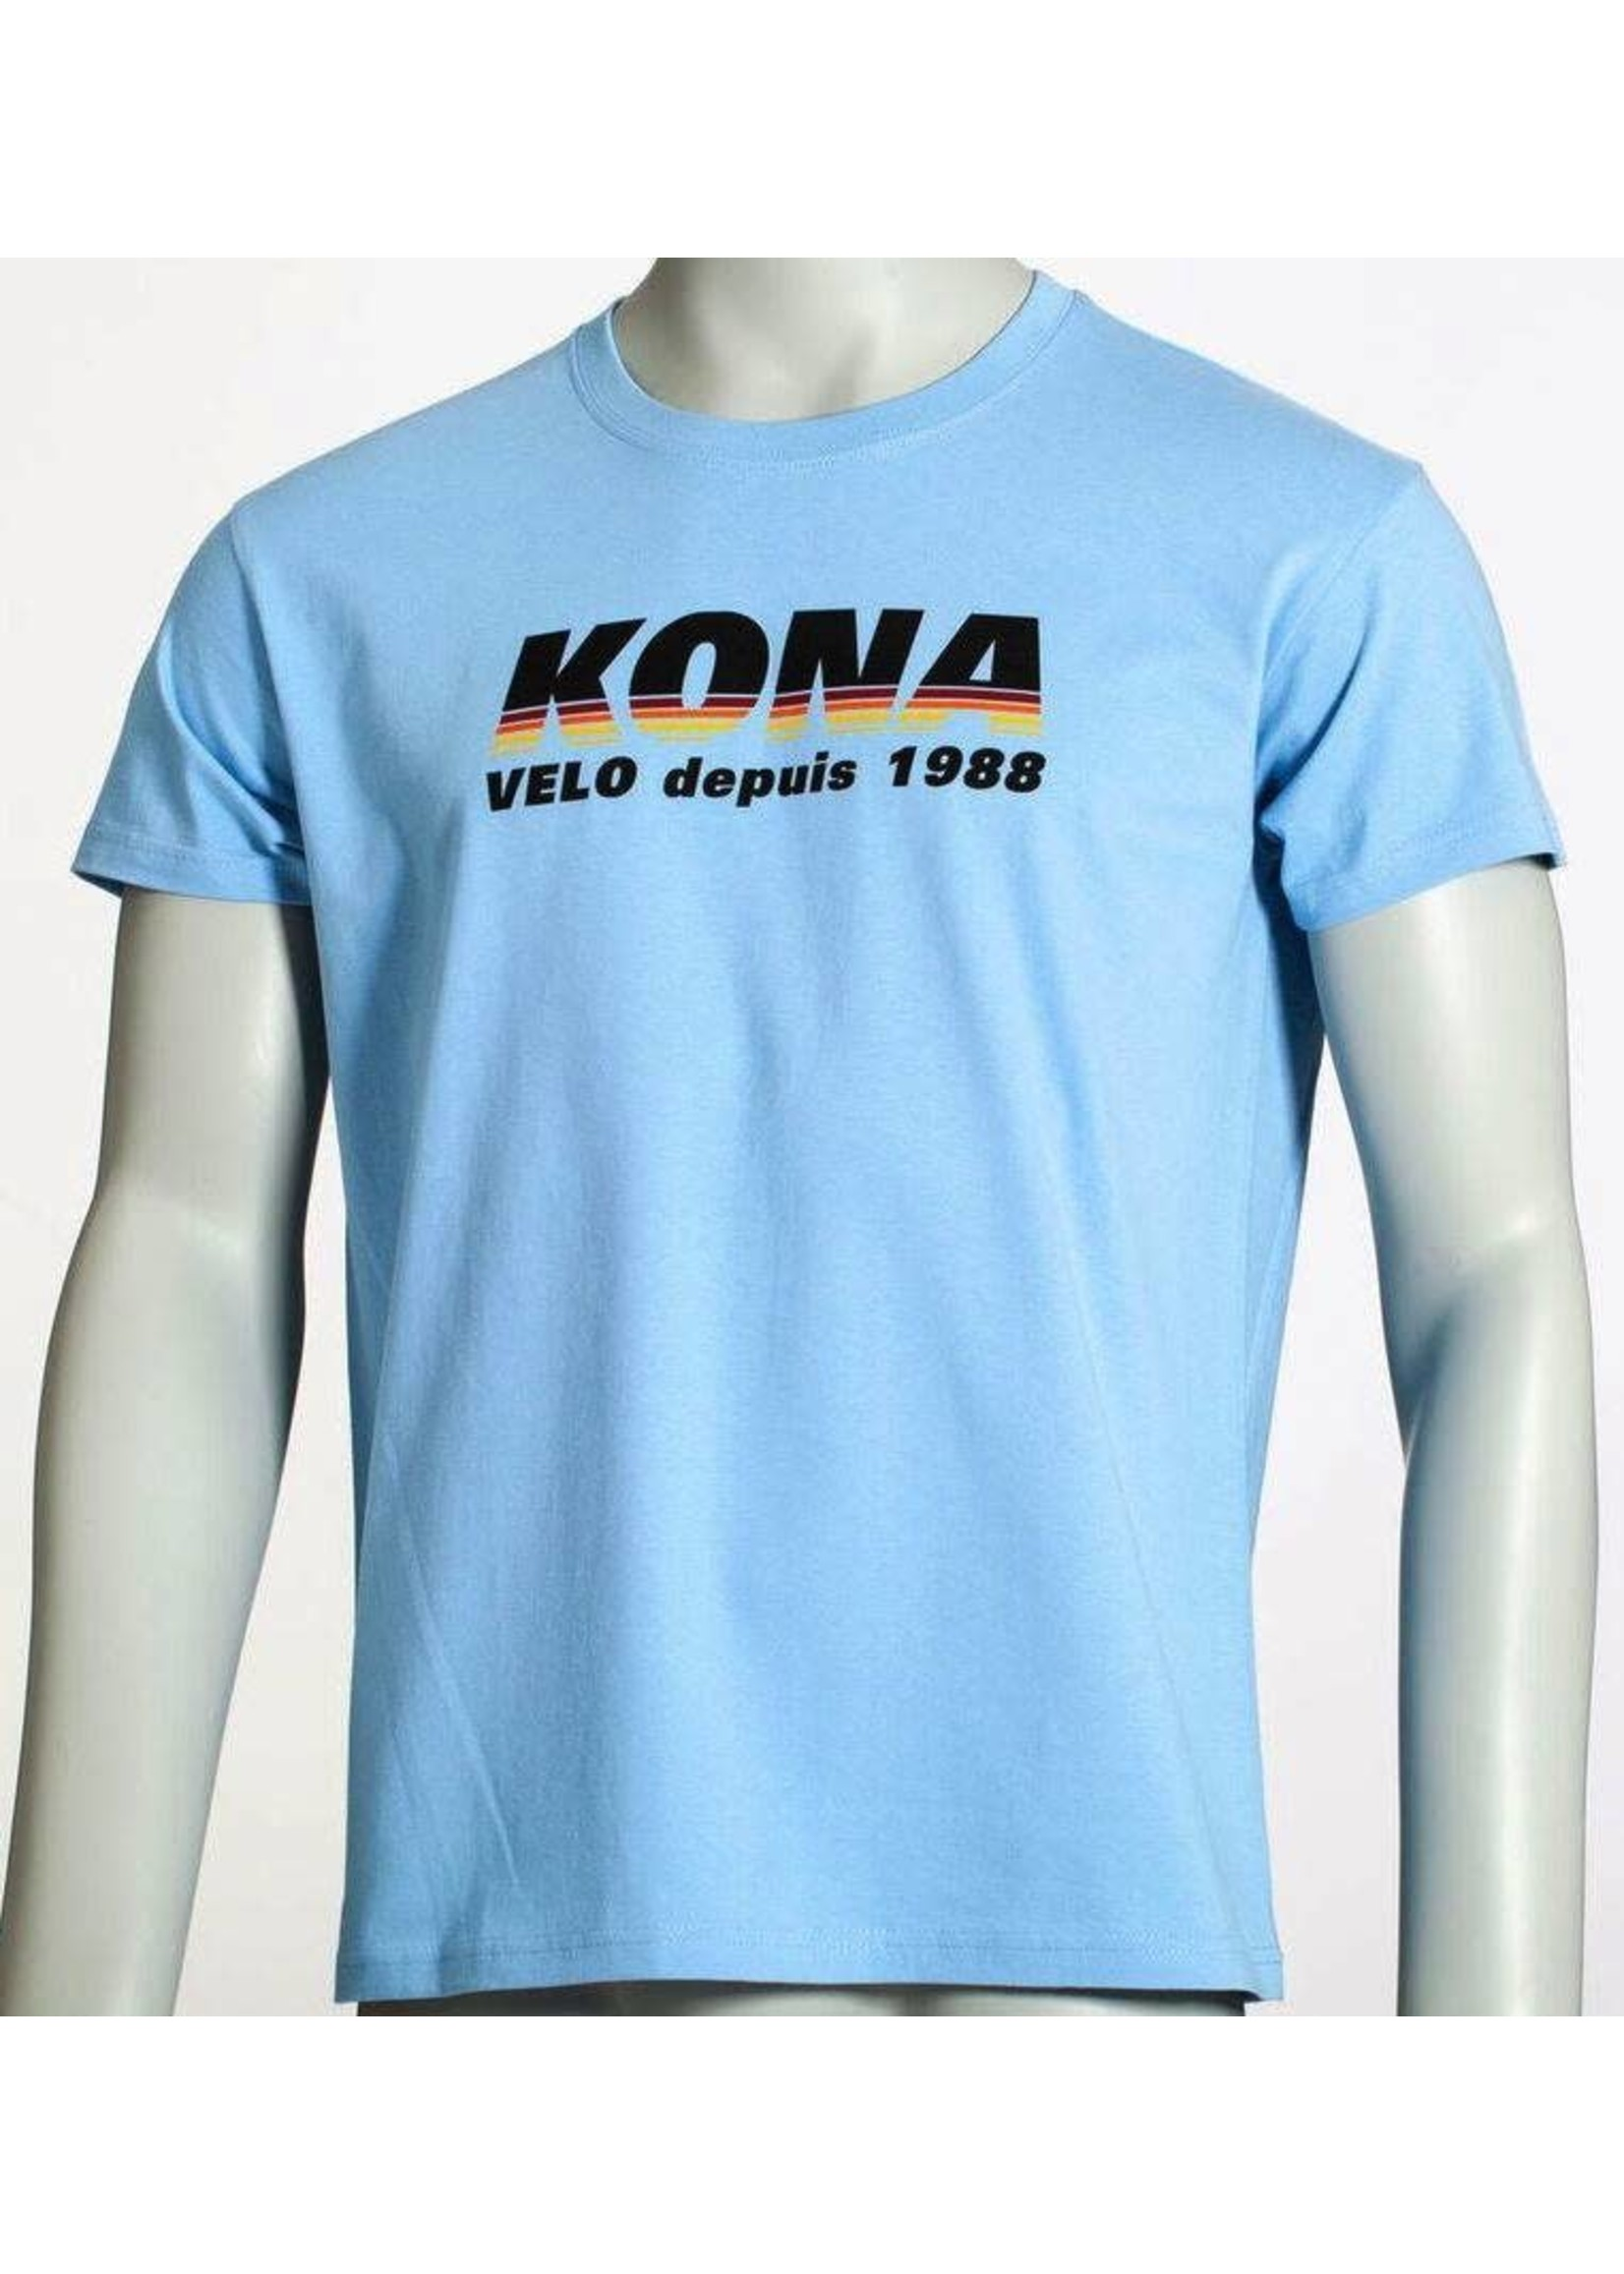 Kona T-Shirt Kona Velo Depuis